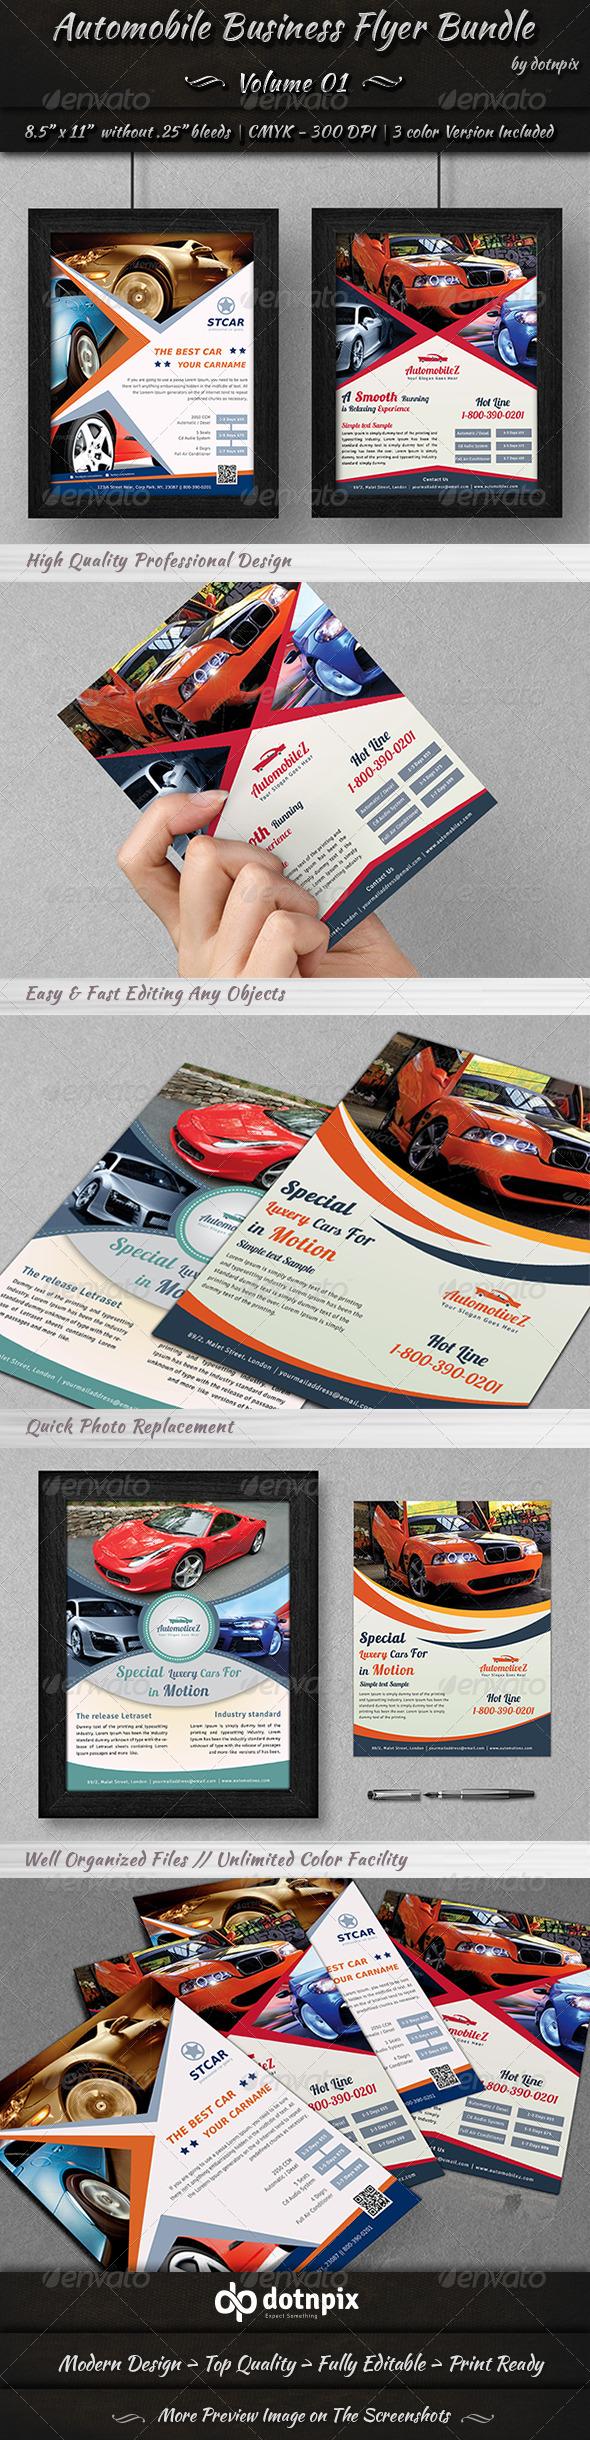 GraphicRiver Automobile Business Flyer Bundle Volume 1 7009900